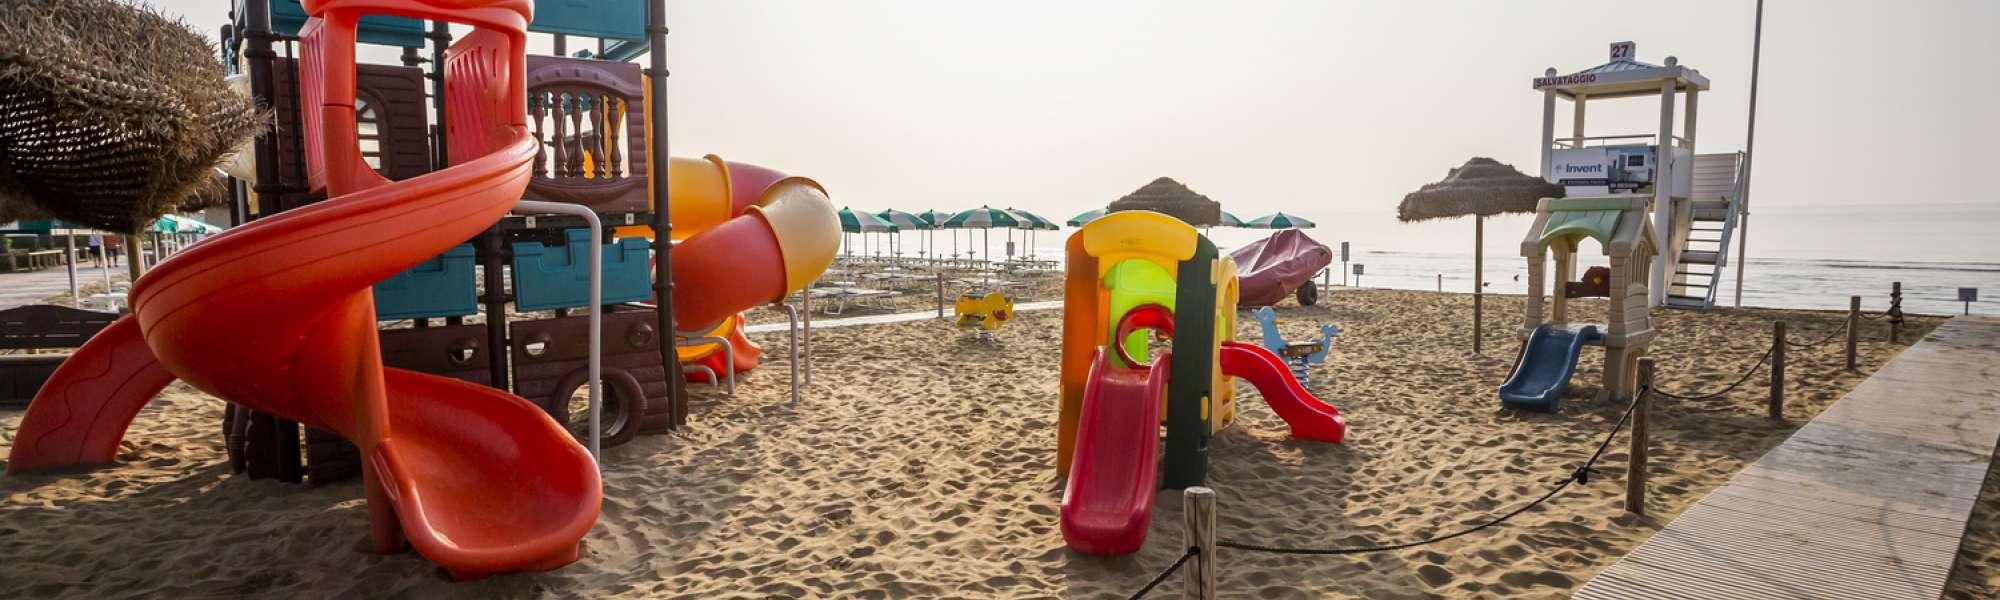 Stabilimento Balneare Green Beach